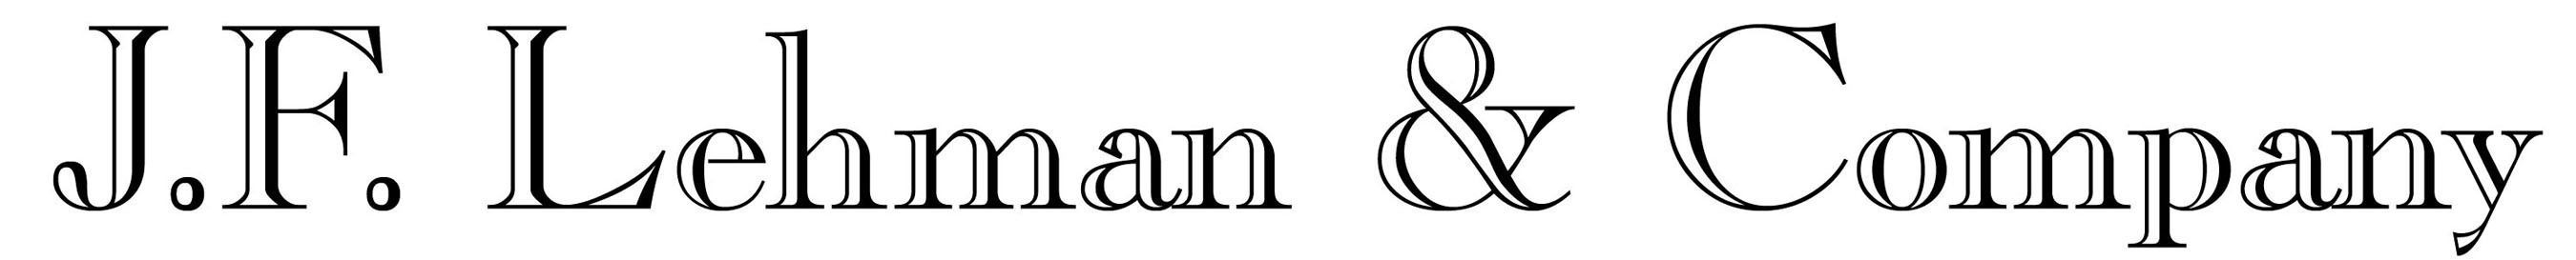 J.F. Lehman & Company logo